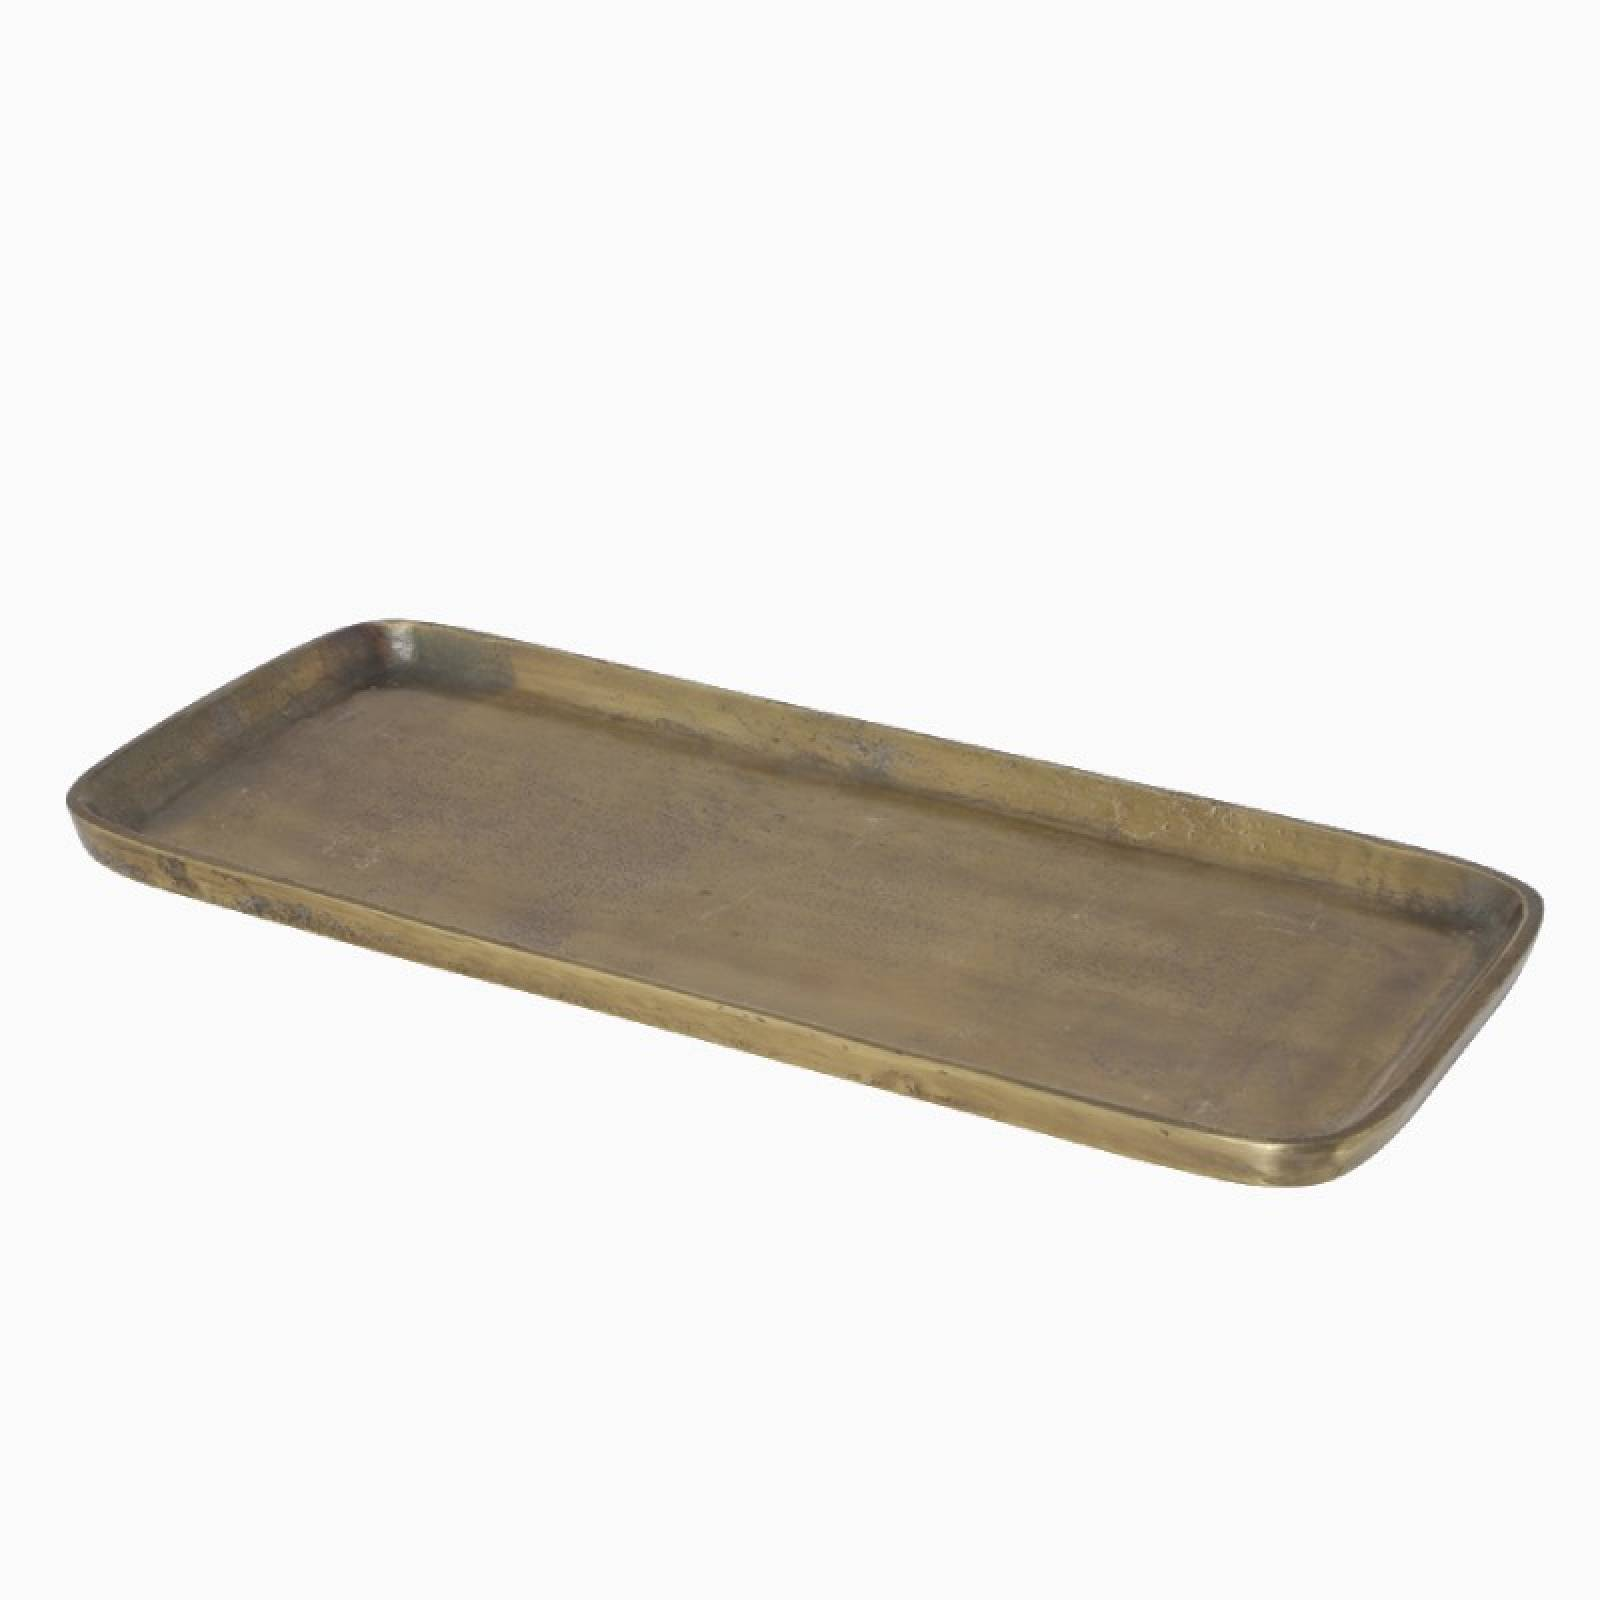 Long Antiqued Bronzed Tray 41x17.5cm